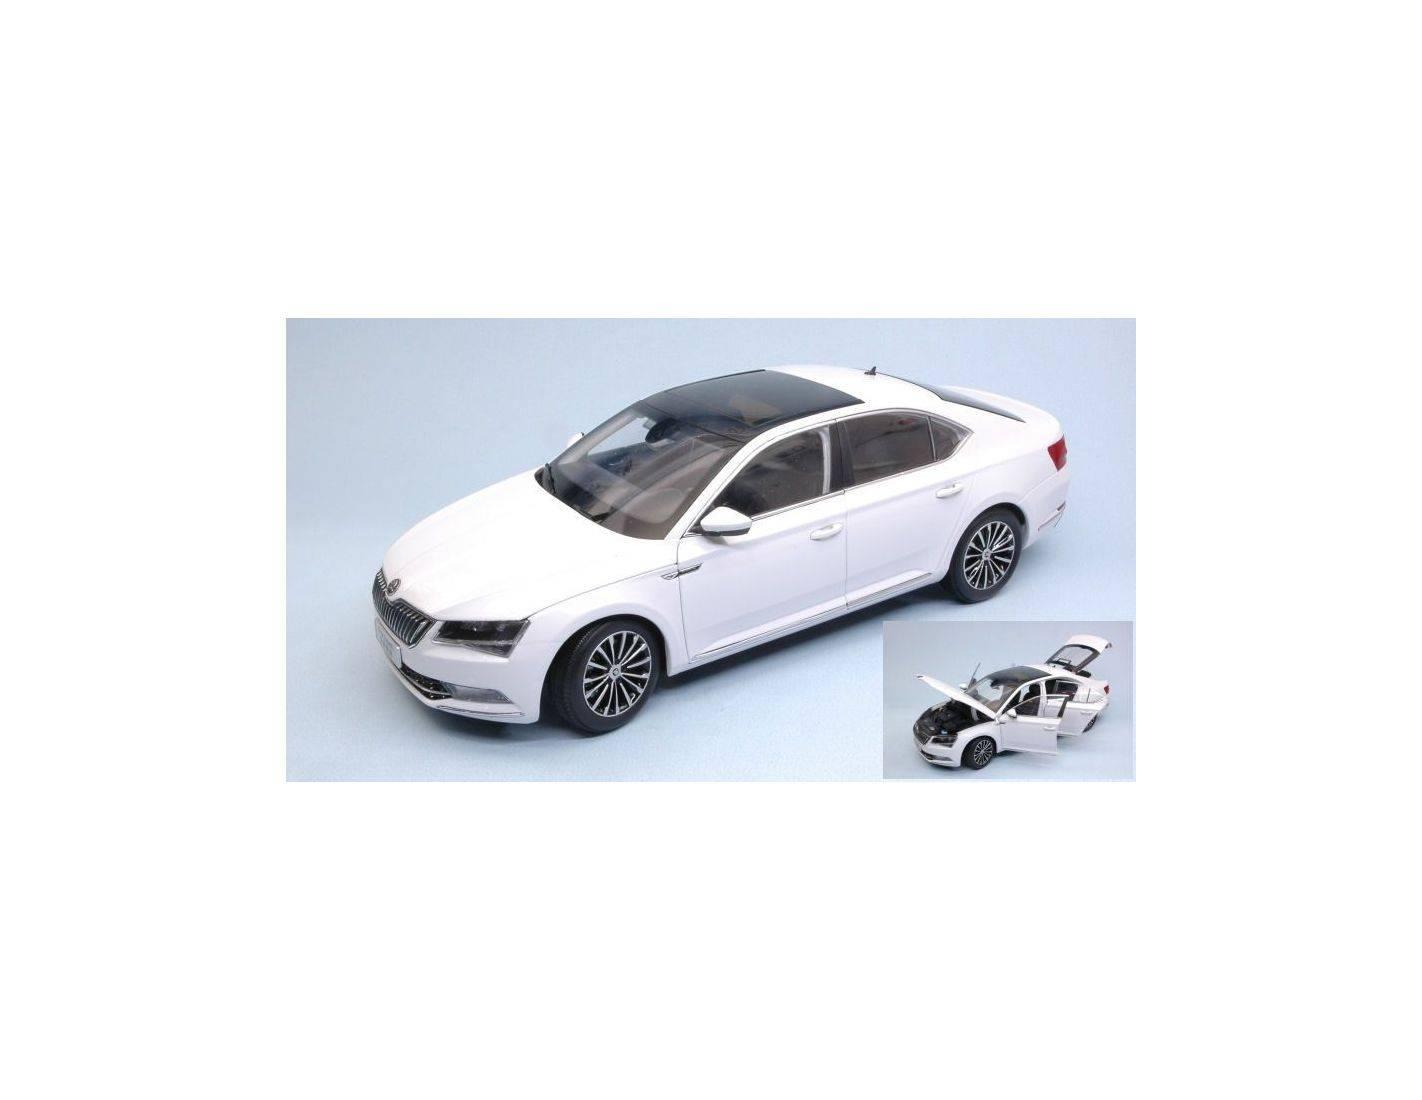 Abrex AB18035SE SKODA SUPERB III 2015 WHITE 1:18 Modellino